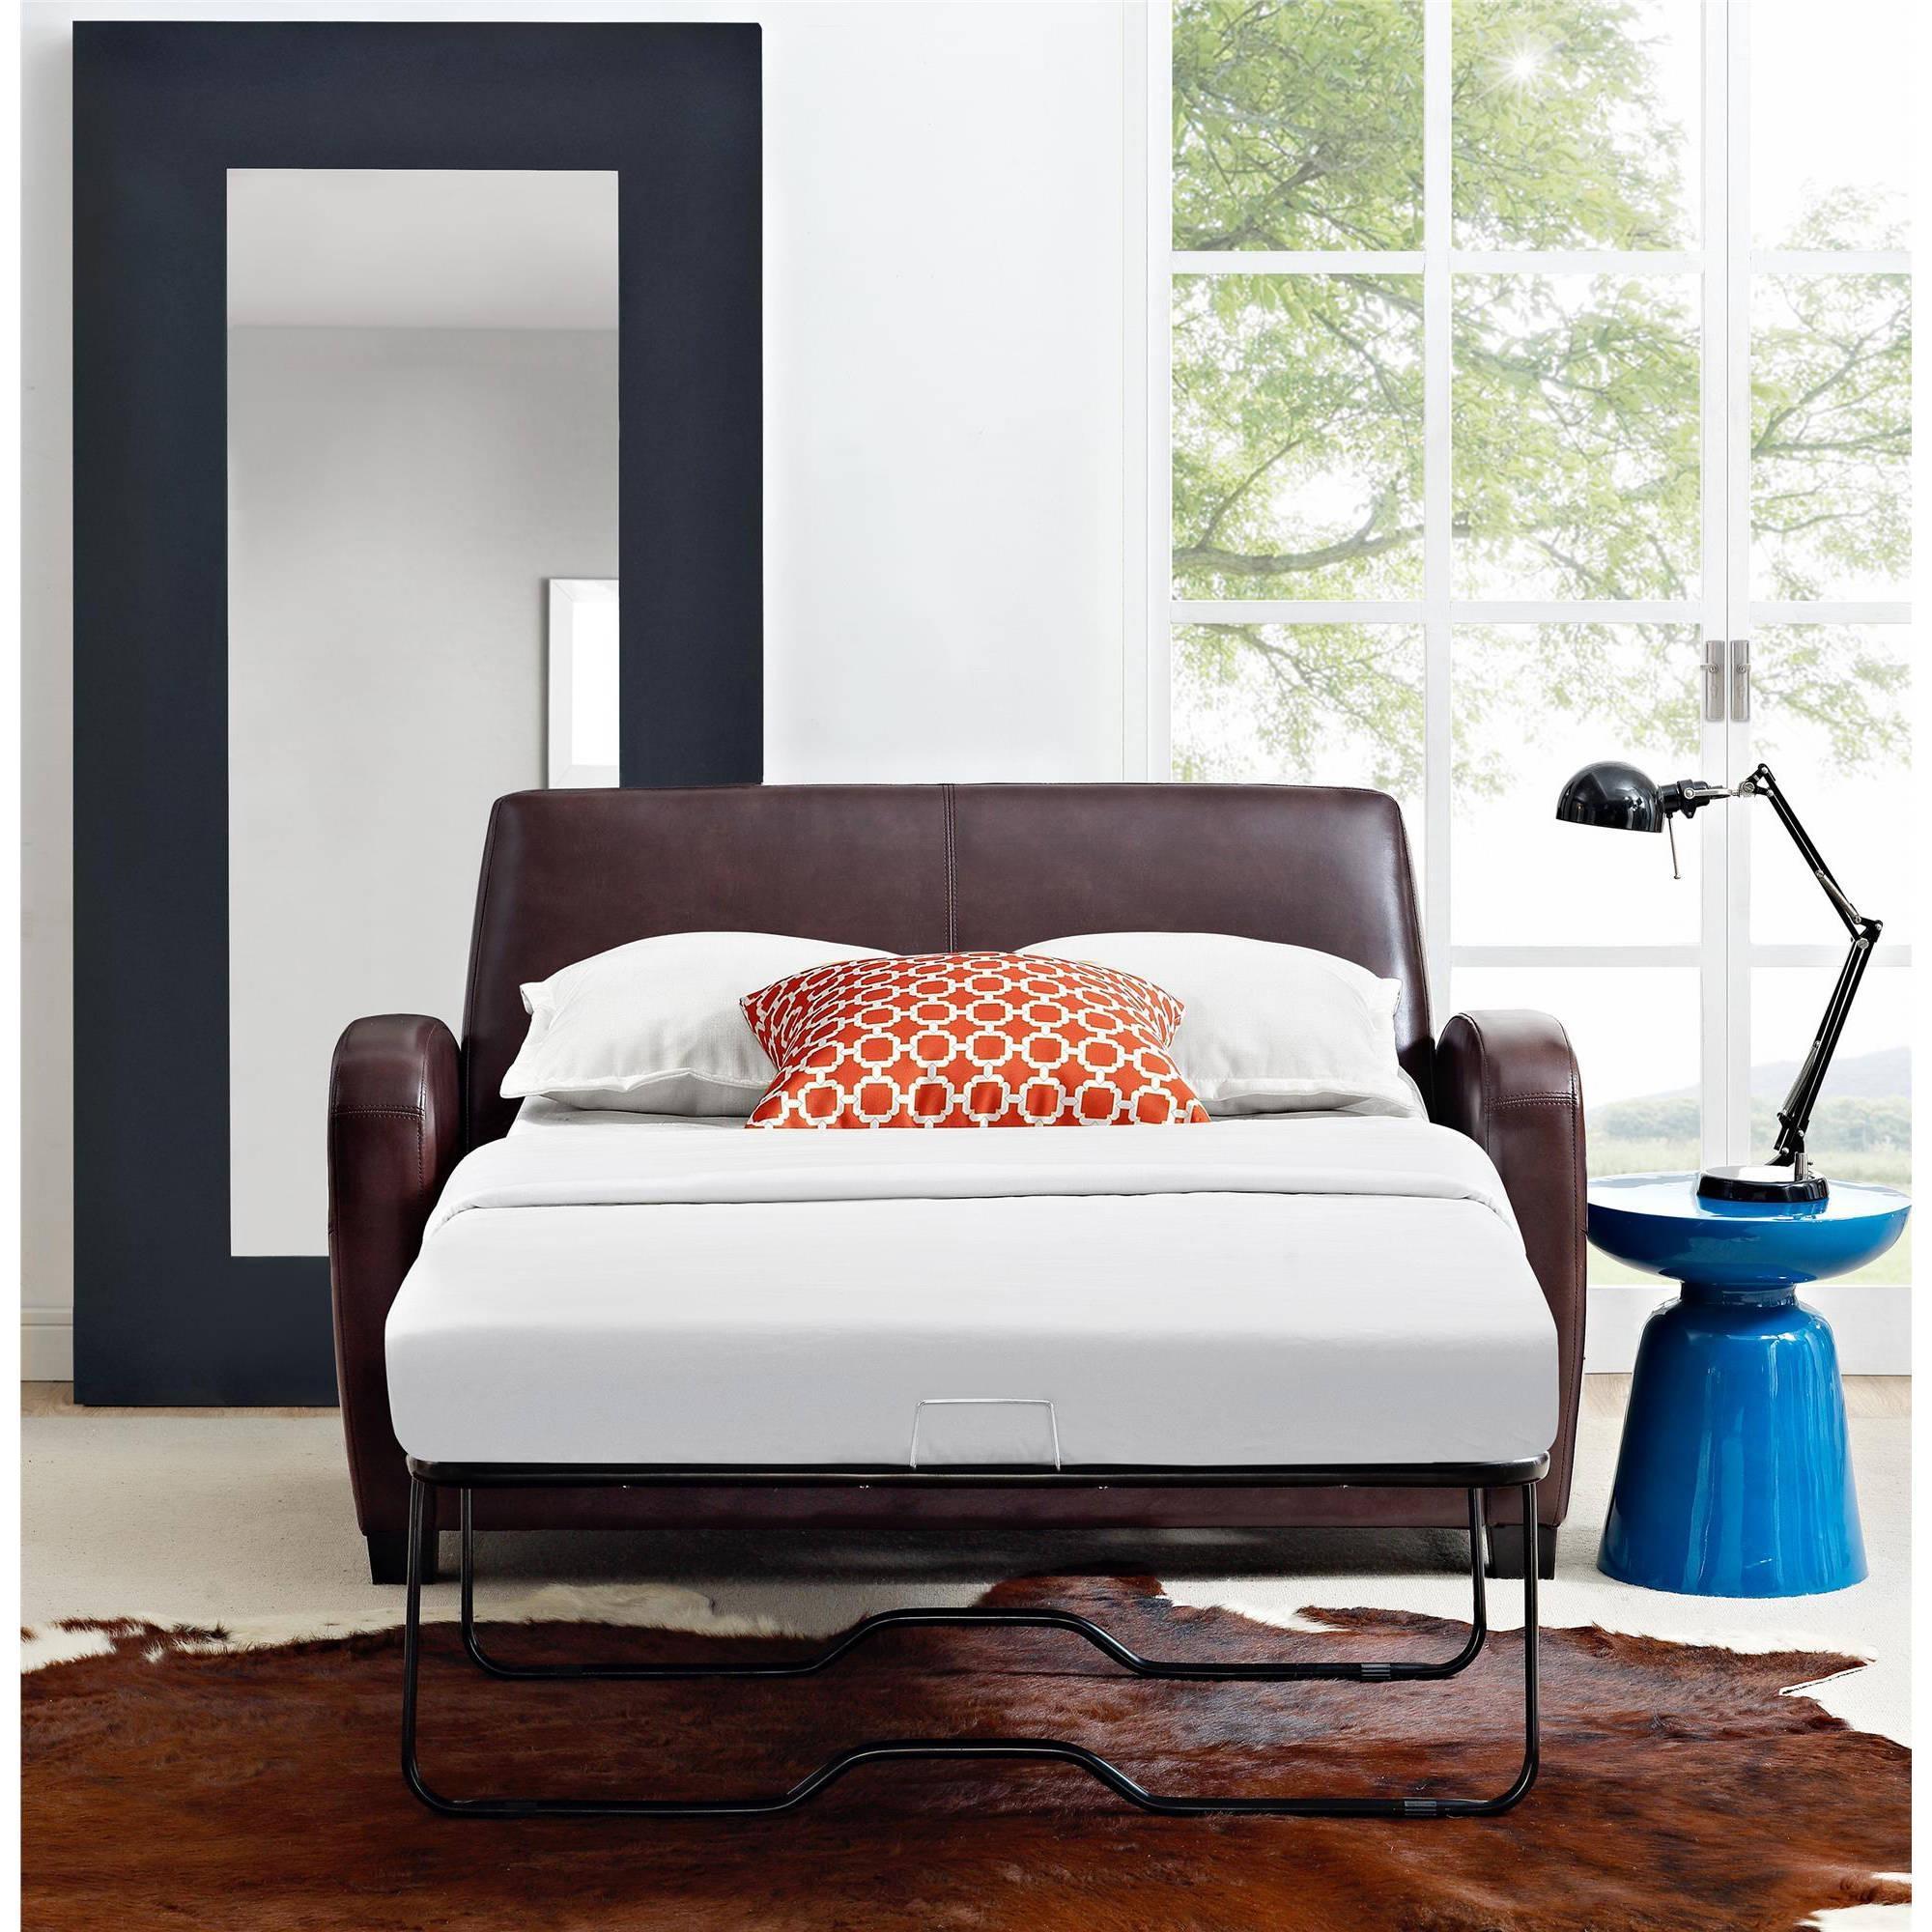 Mainstays Sofa Sleeper, Black – Walmart Throughout Mainstays Sleeper Sofas (Image 15 of 20)